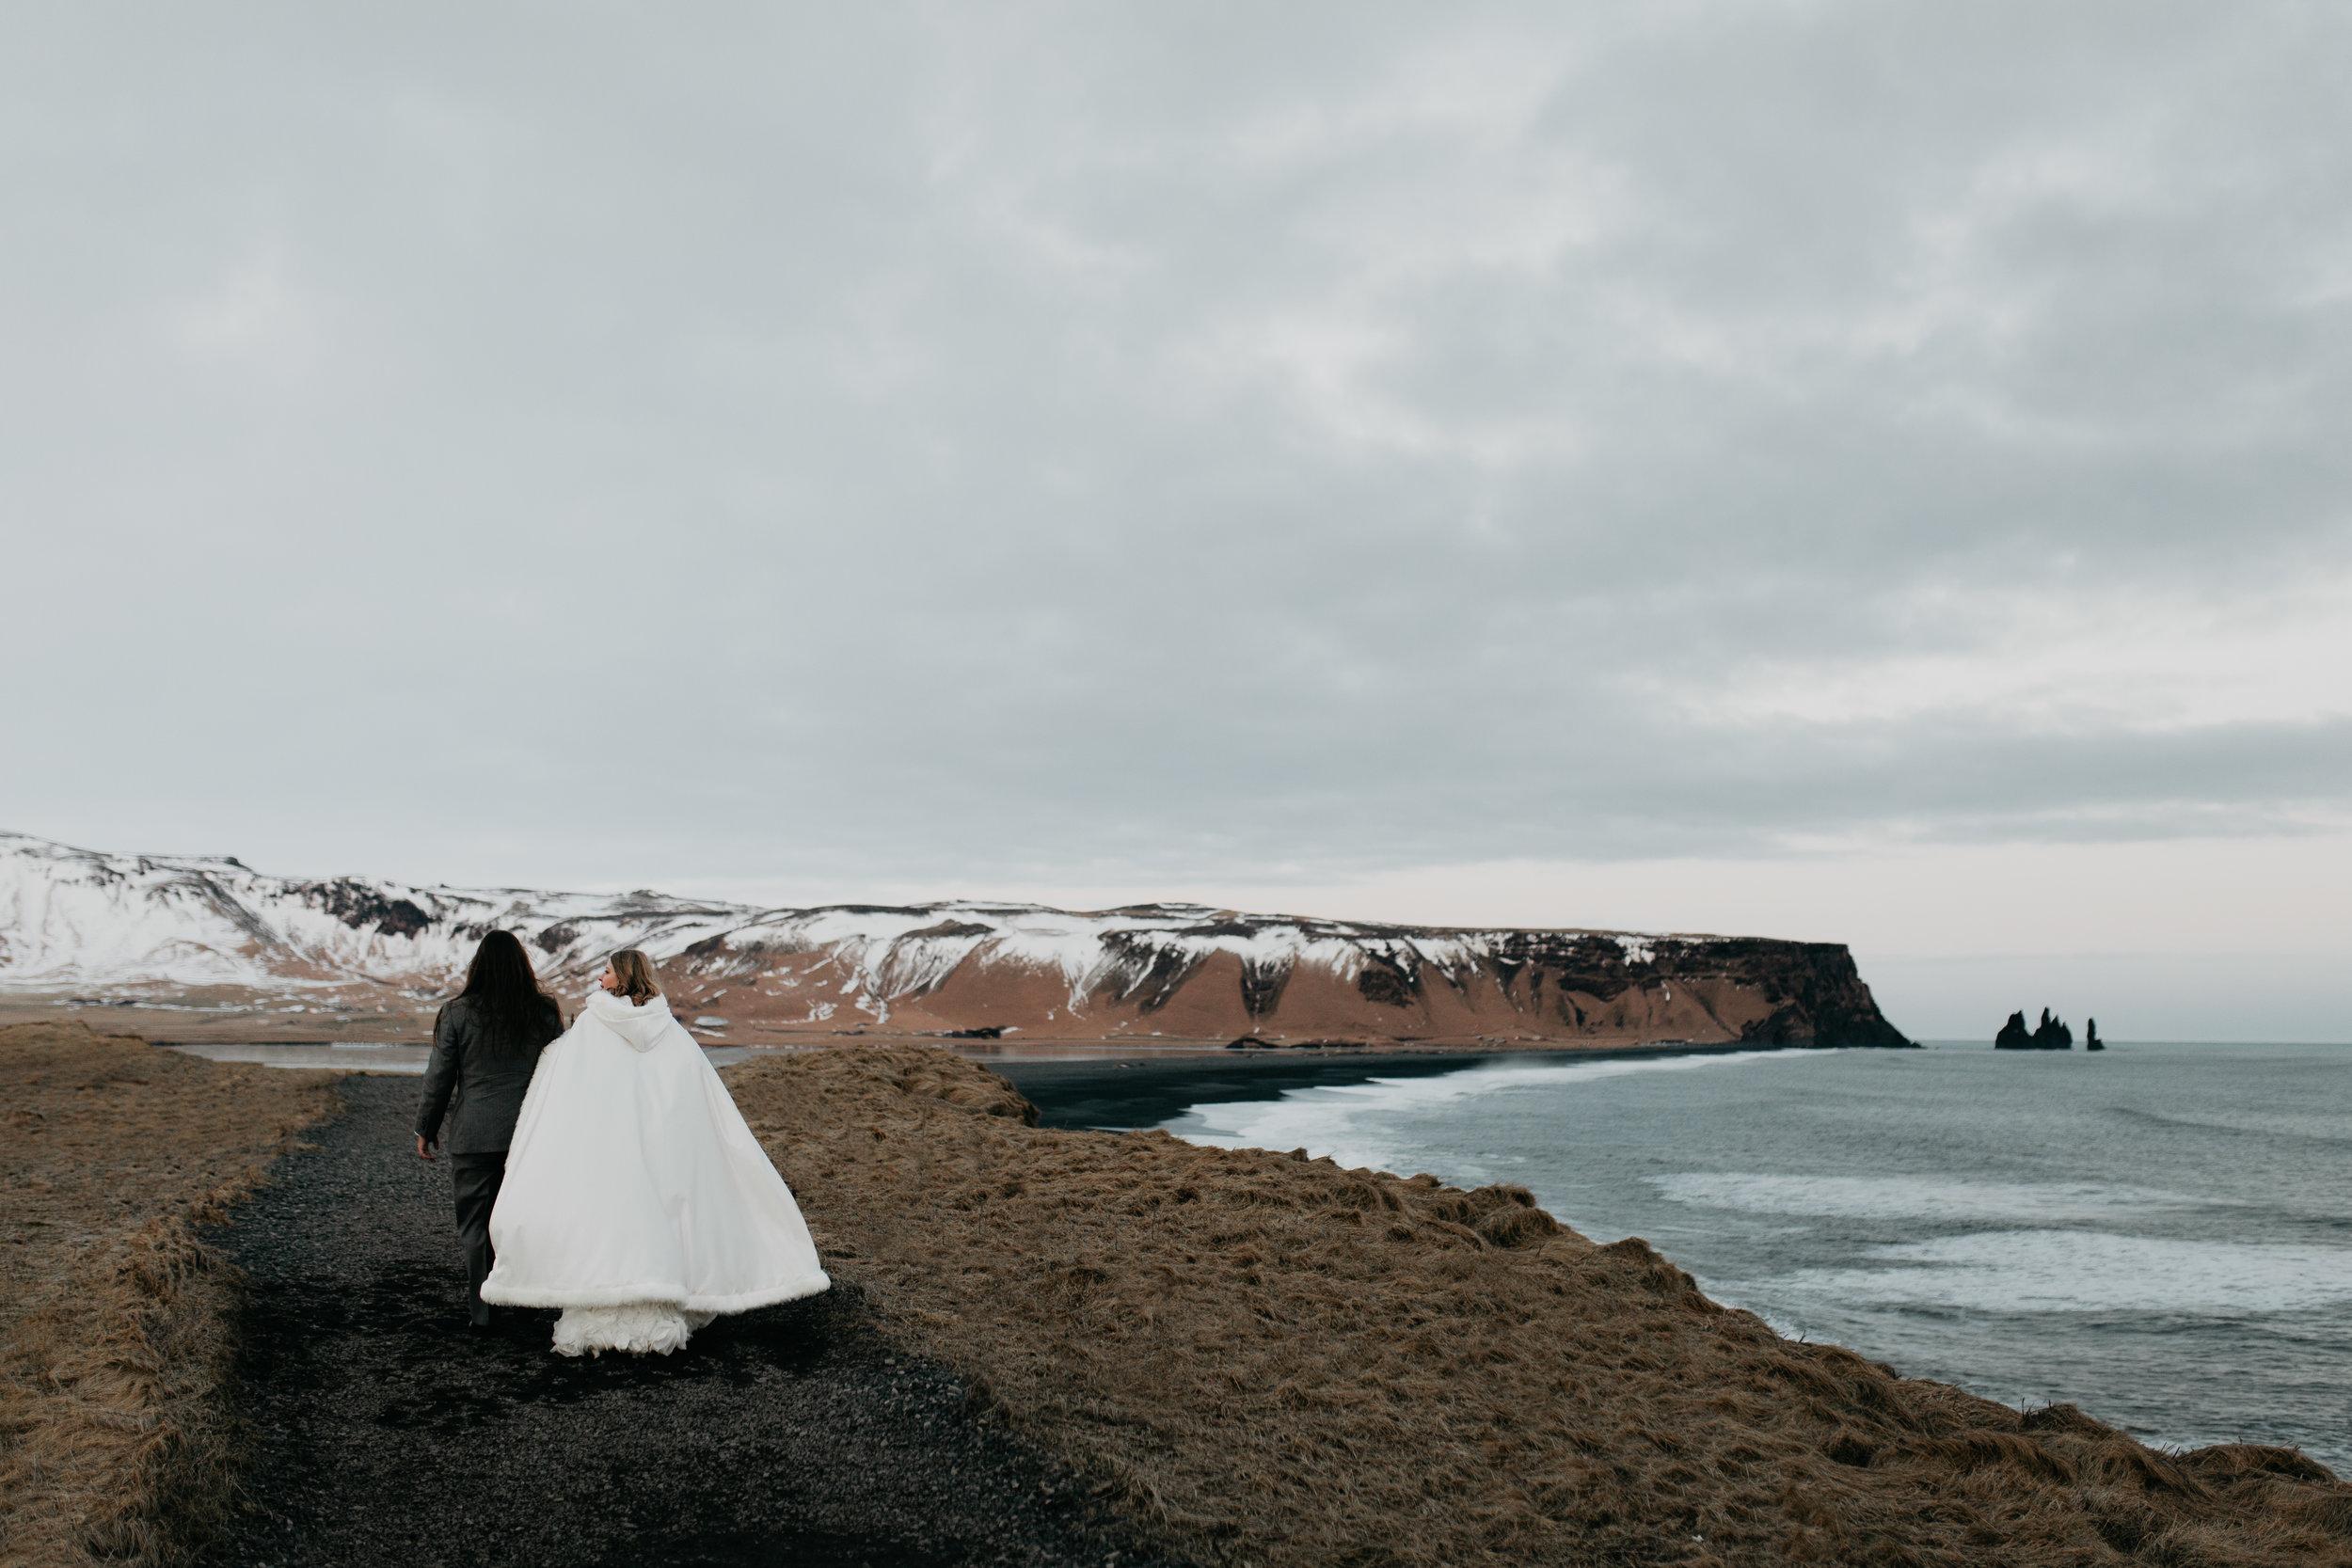 nicole-daacke-photography-iceland-winter-sunset-adventure-elopement-skogafoss-waterfall-black-sand-beach-dyrholaey-vik-iceland-intimate-wedding-black-church-elopement-photographer-52.jpg